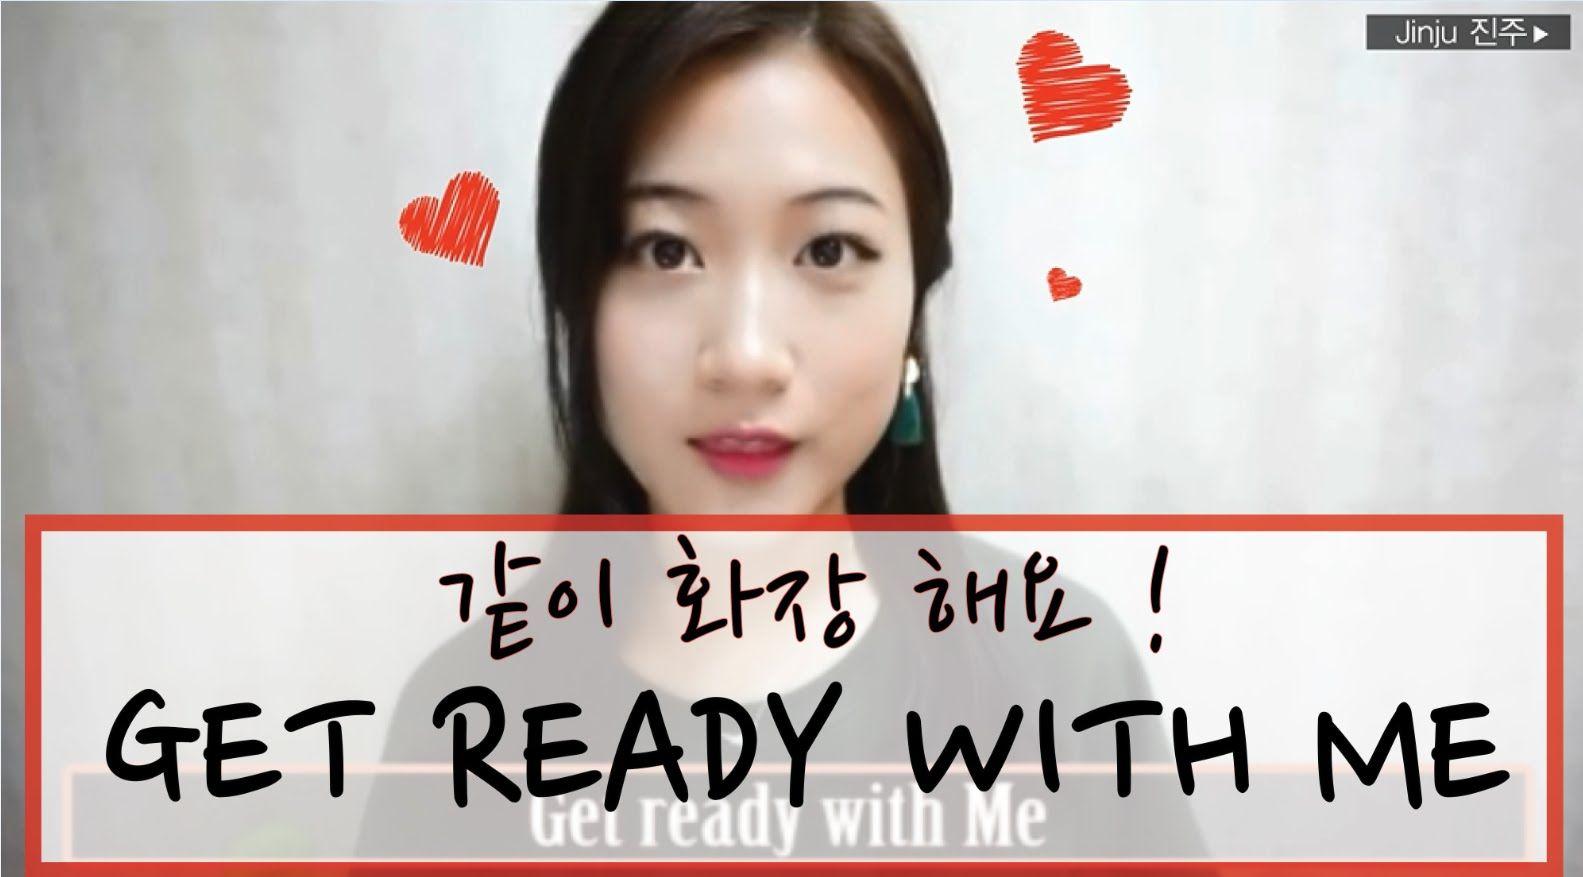 [Eng] 같이 화장 해요! 등교하기전, 데일리 메이크업   Get Ready With Me ! ♥